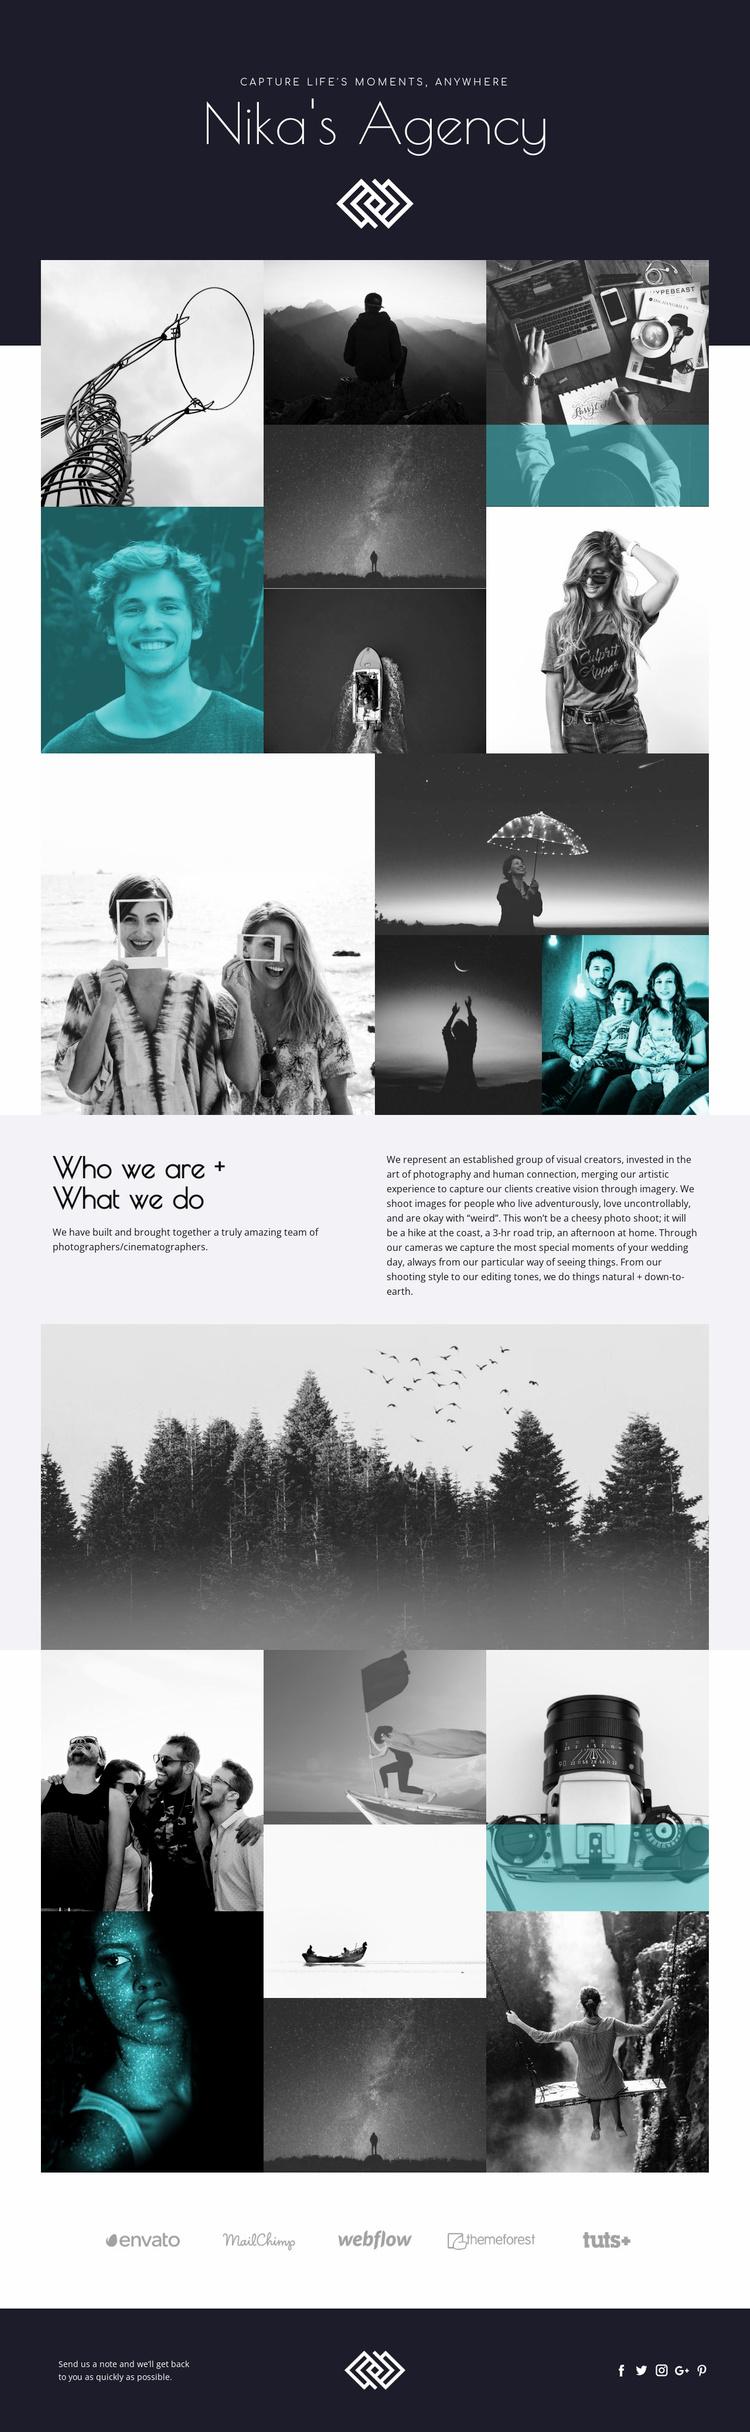 Nika's Agency Website Template